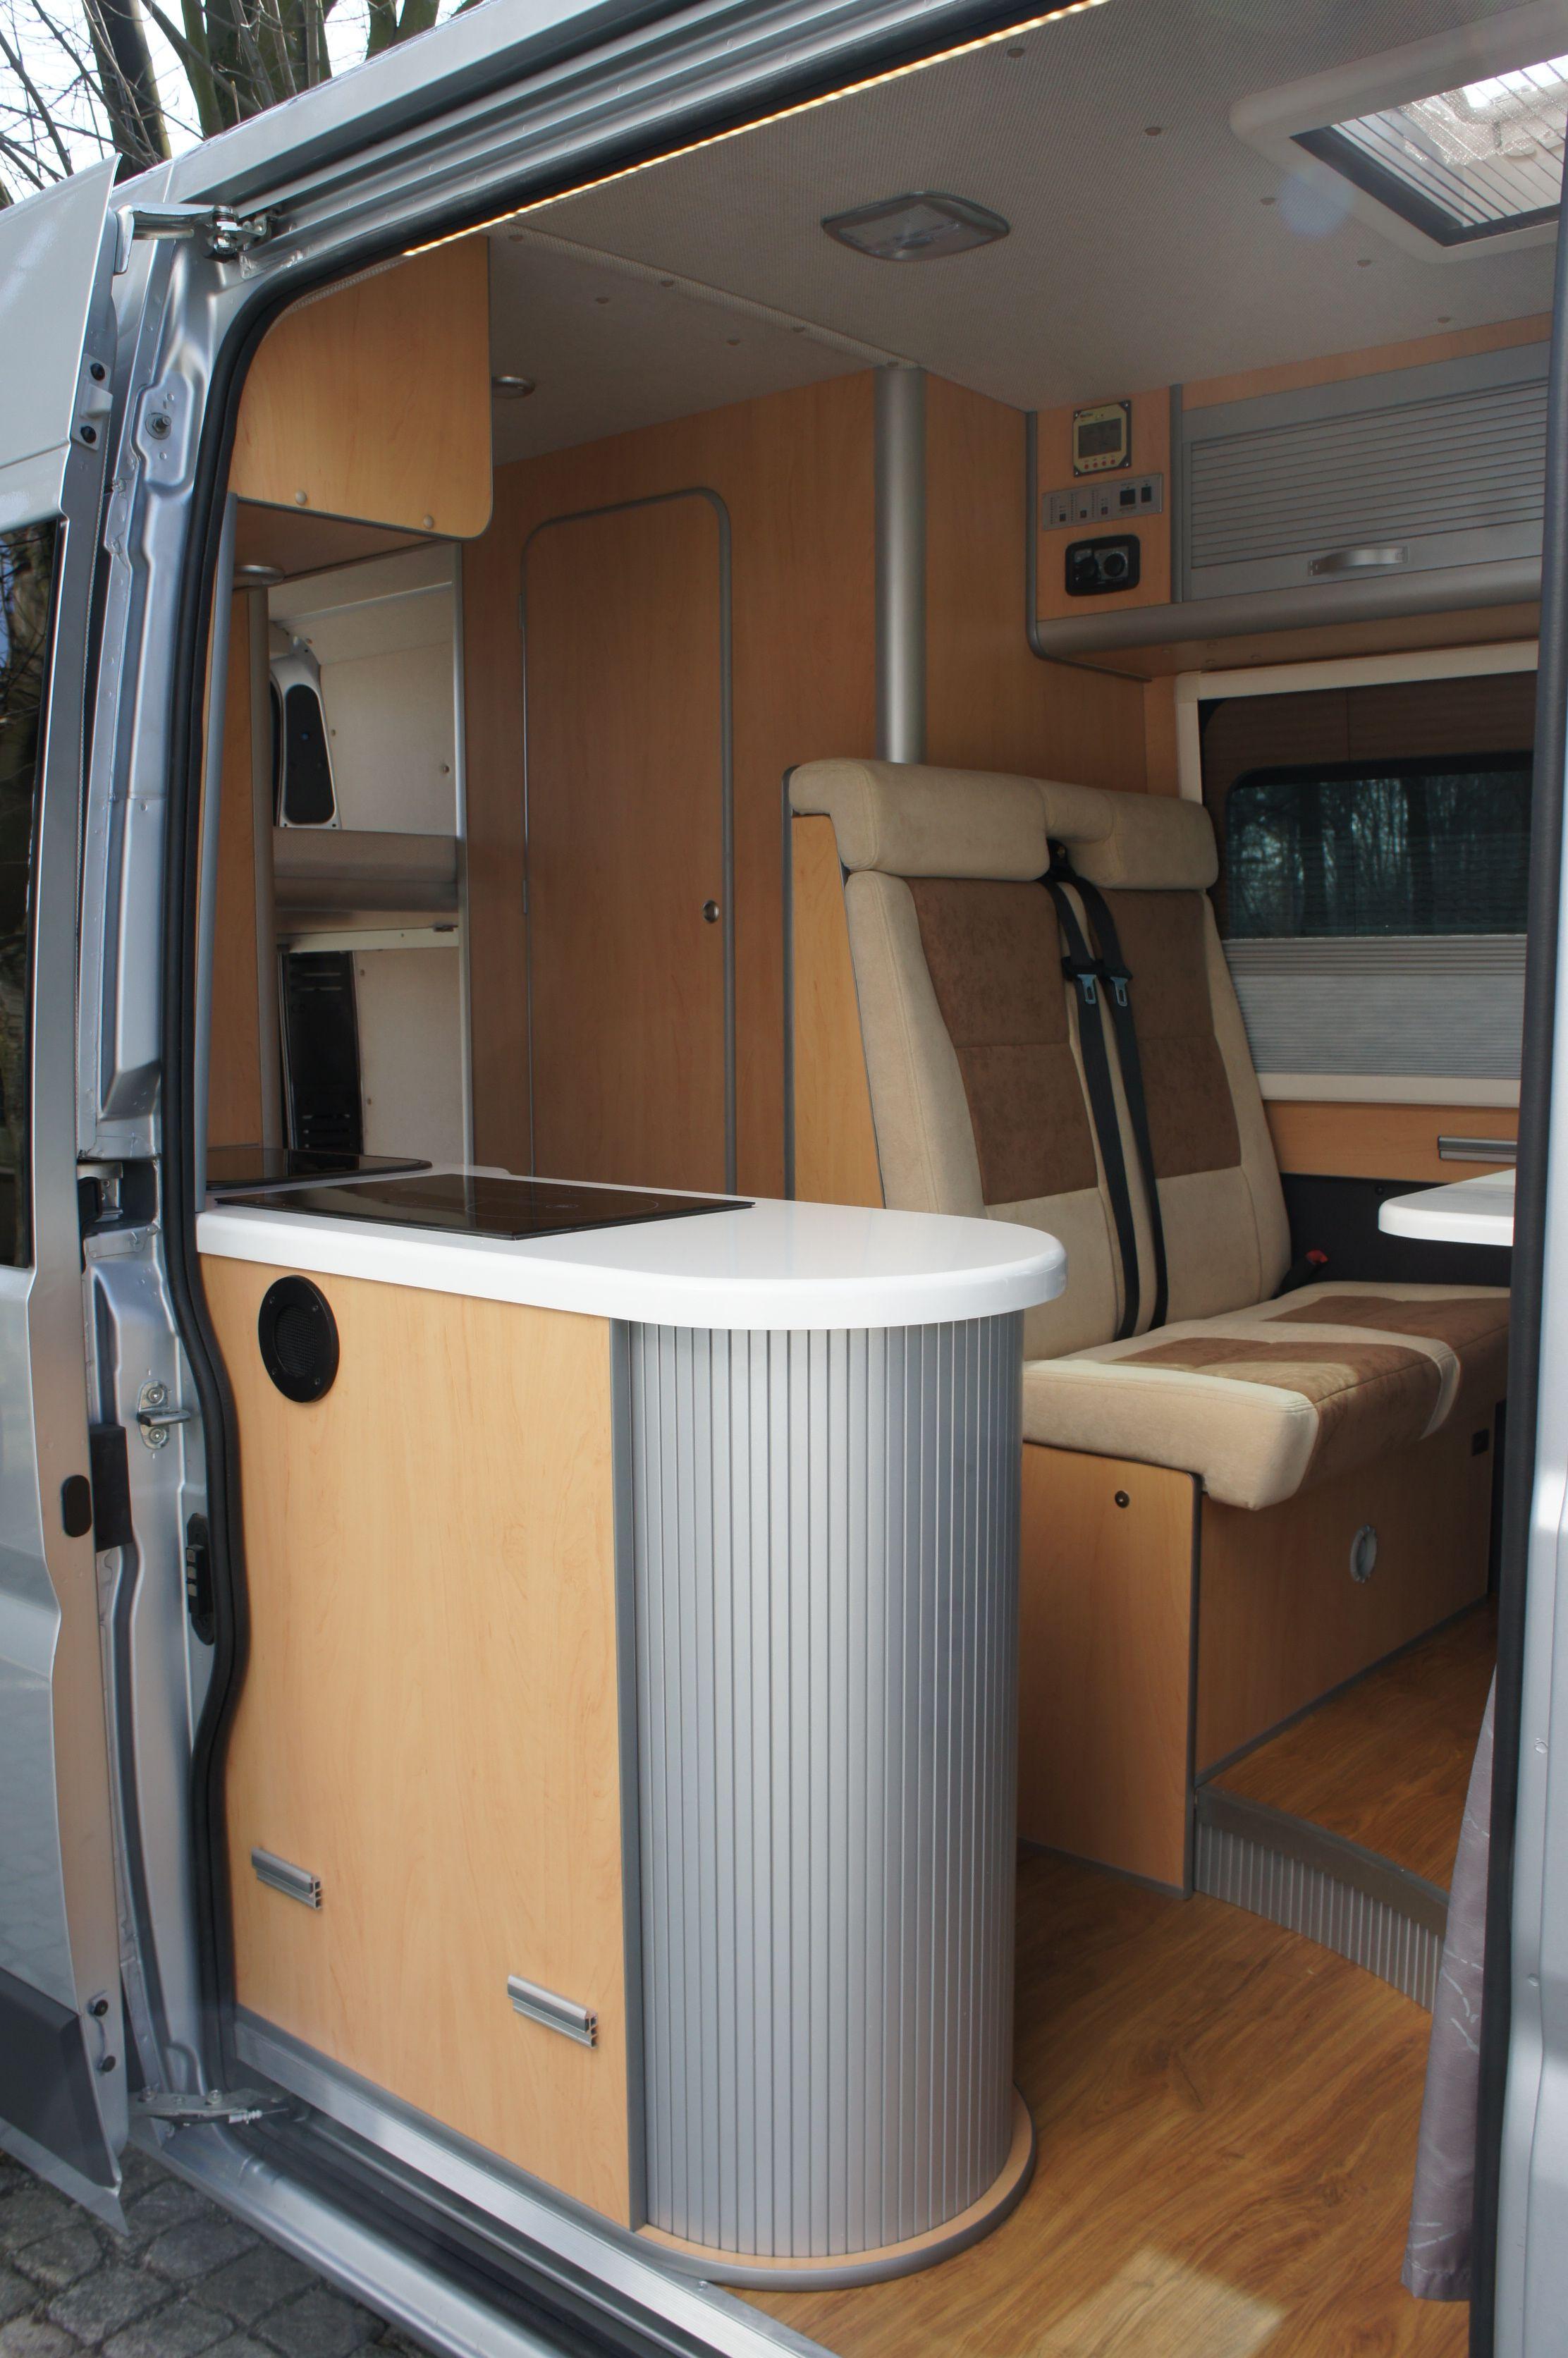 fiat ducato camper inside fiat ducato campervan motorhome pinterest fiat vans and van. Black Bedroom Furniture Sets. Home Design Ideas